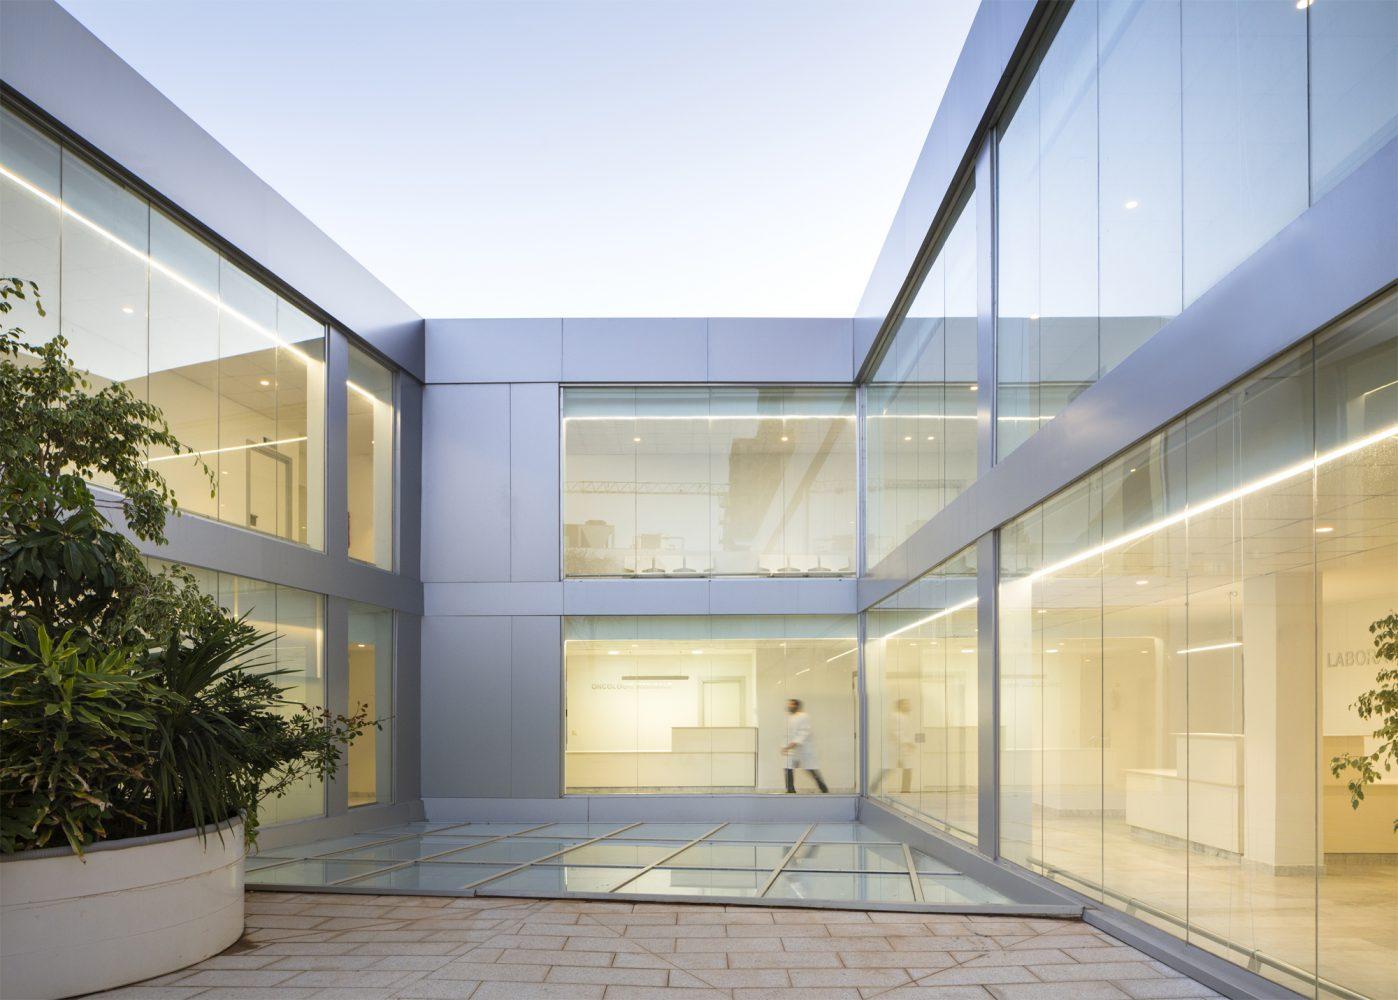 Lecoc arquitectura_arquitecto_valencia_hospital_oncológico_orán_argelia_04